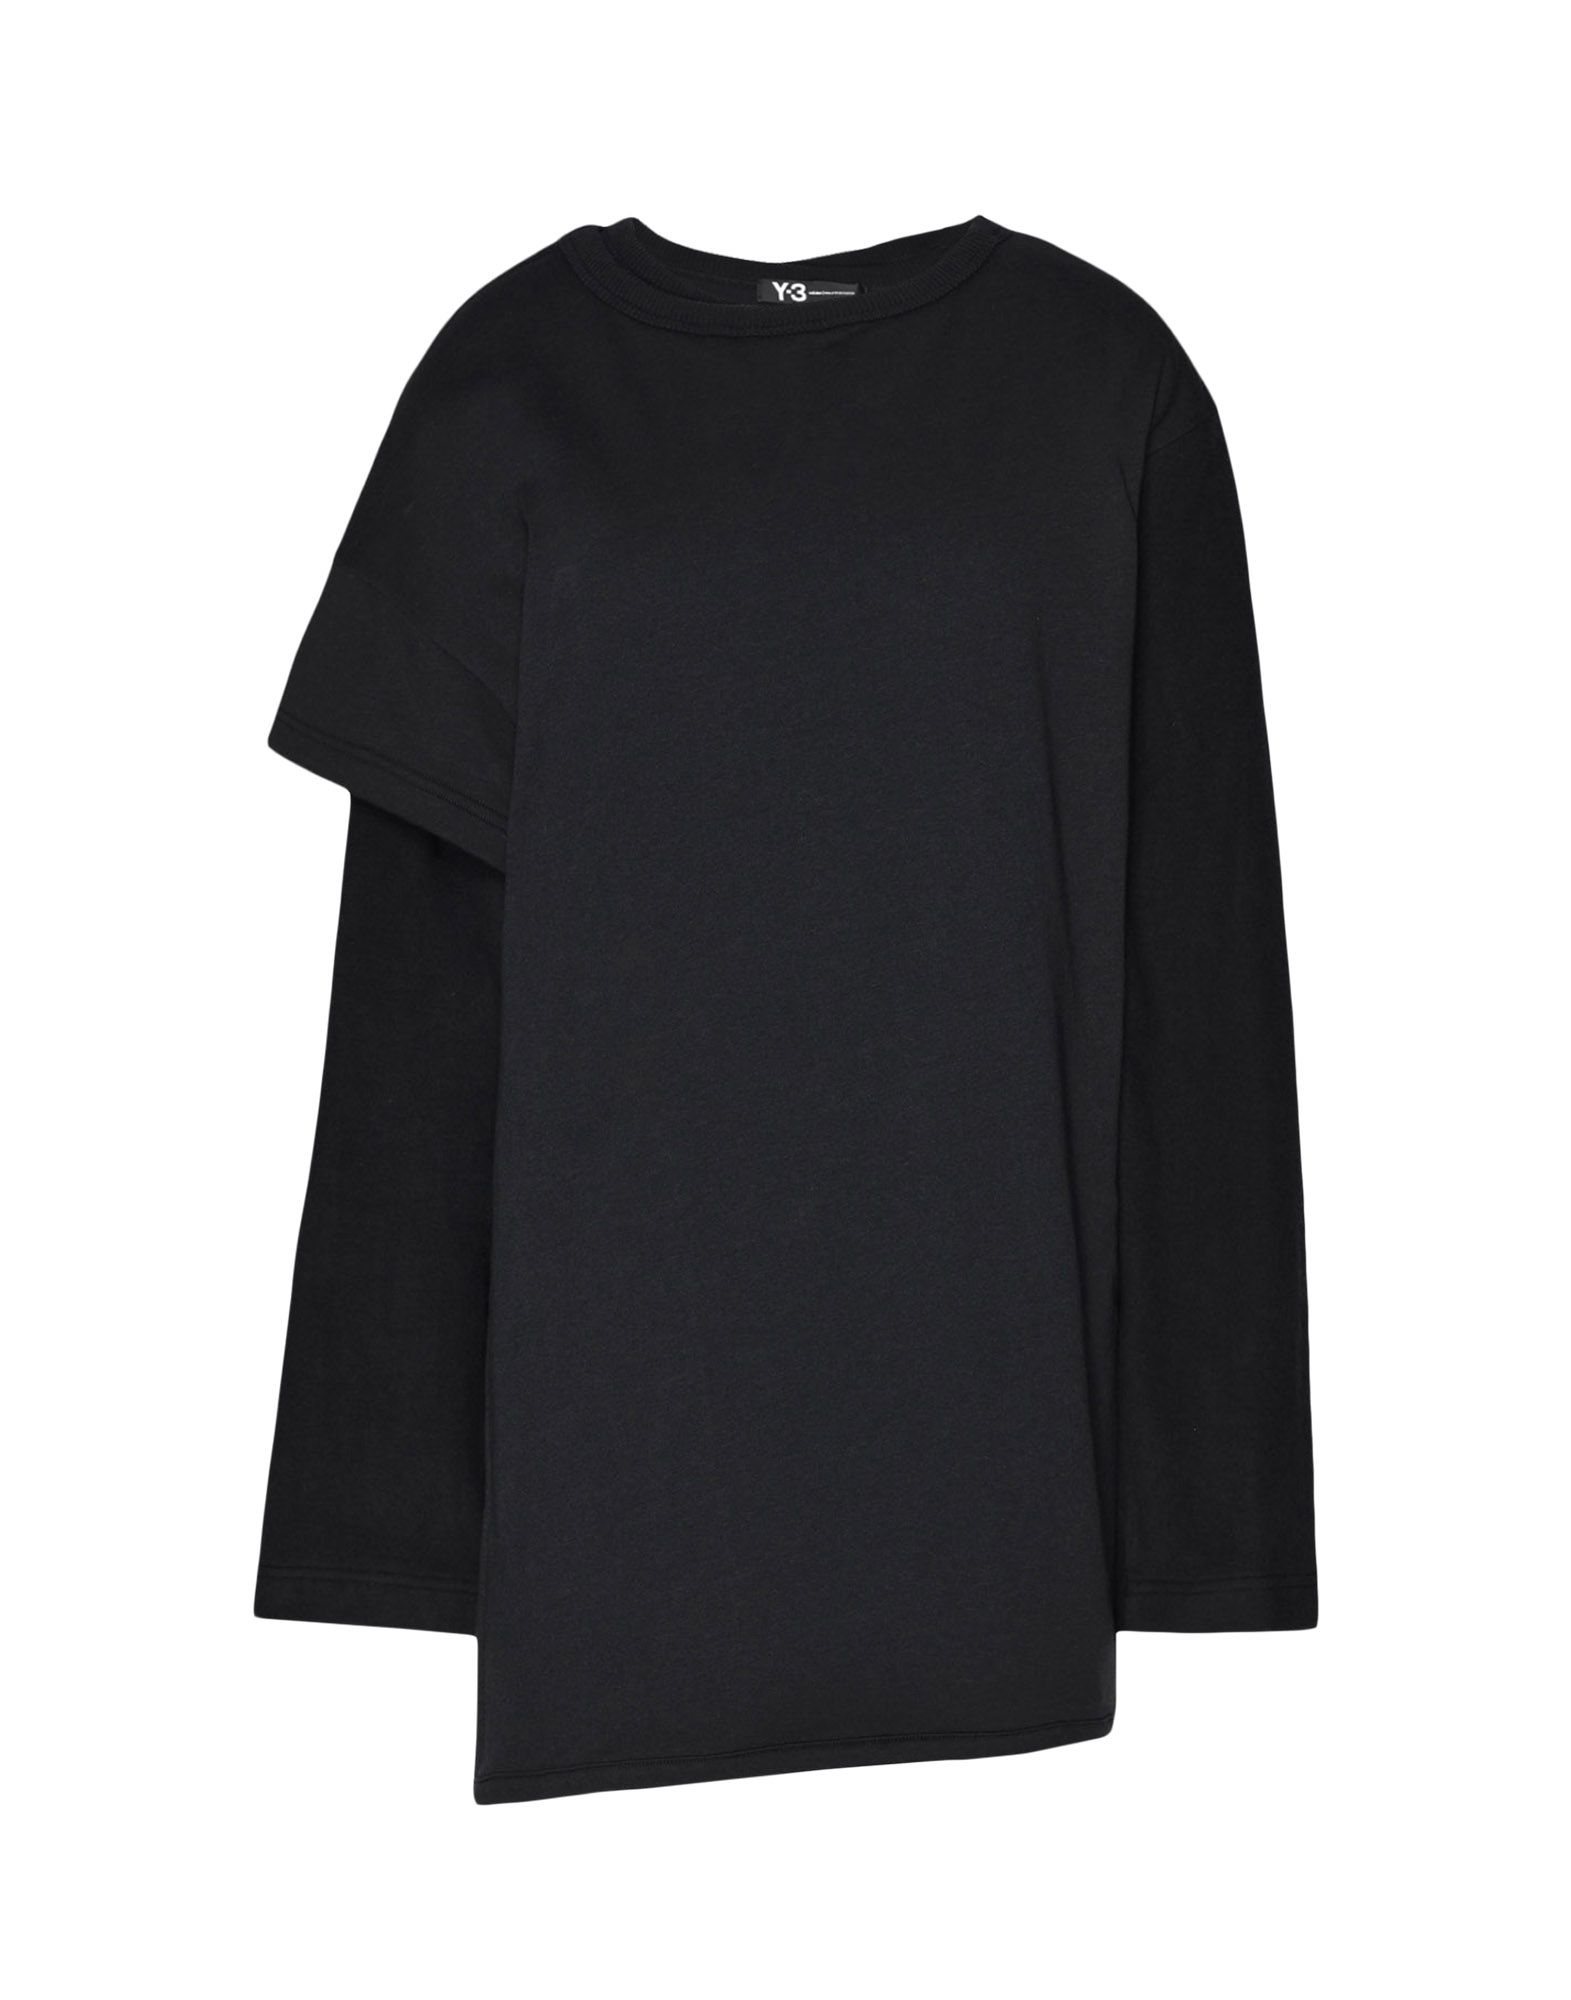 Y-3 Y-3 Two-Layer Fleece Sweater Sweatshirt Woman f